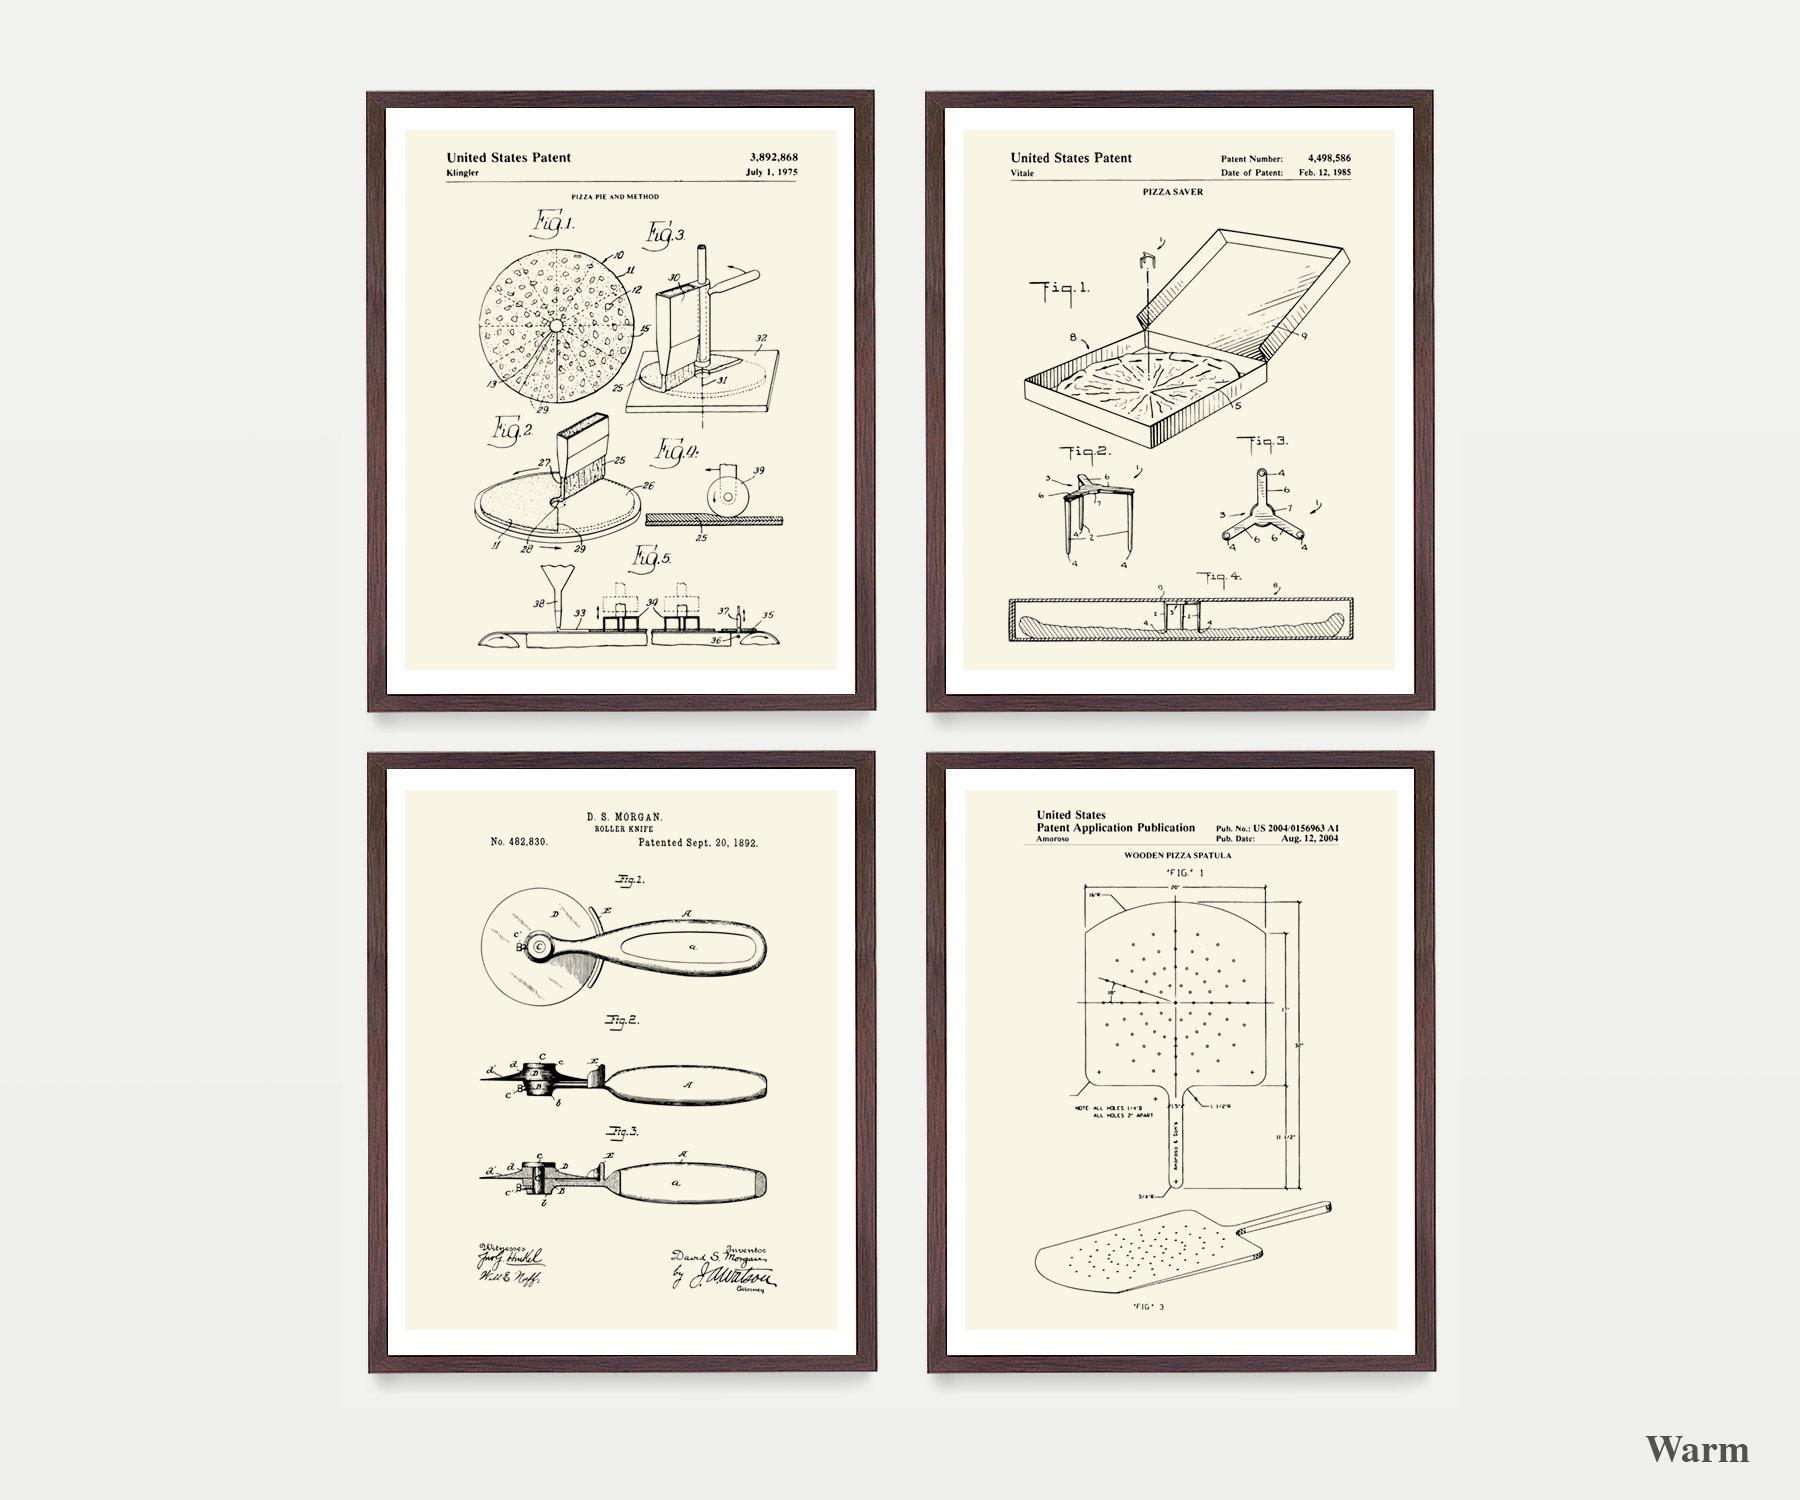 Kitchen Wall Decor Pizza Cutter Patent Art Print 1